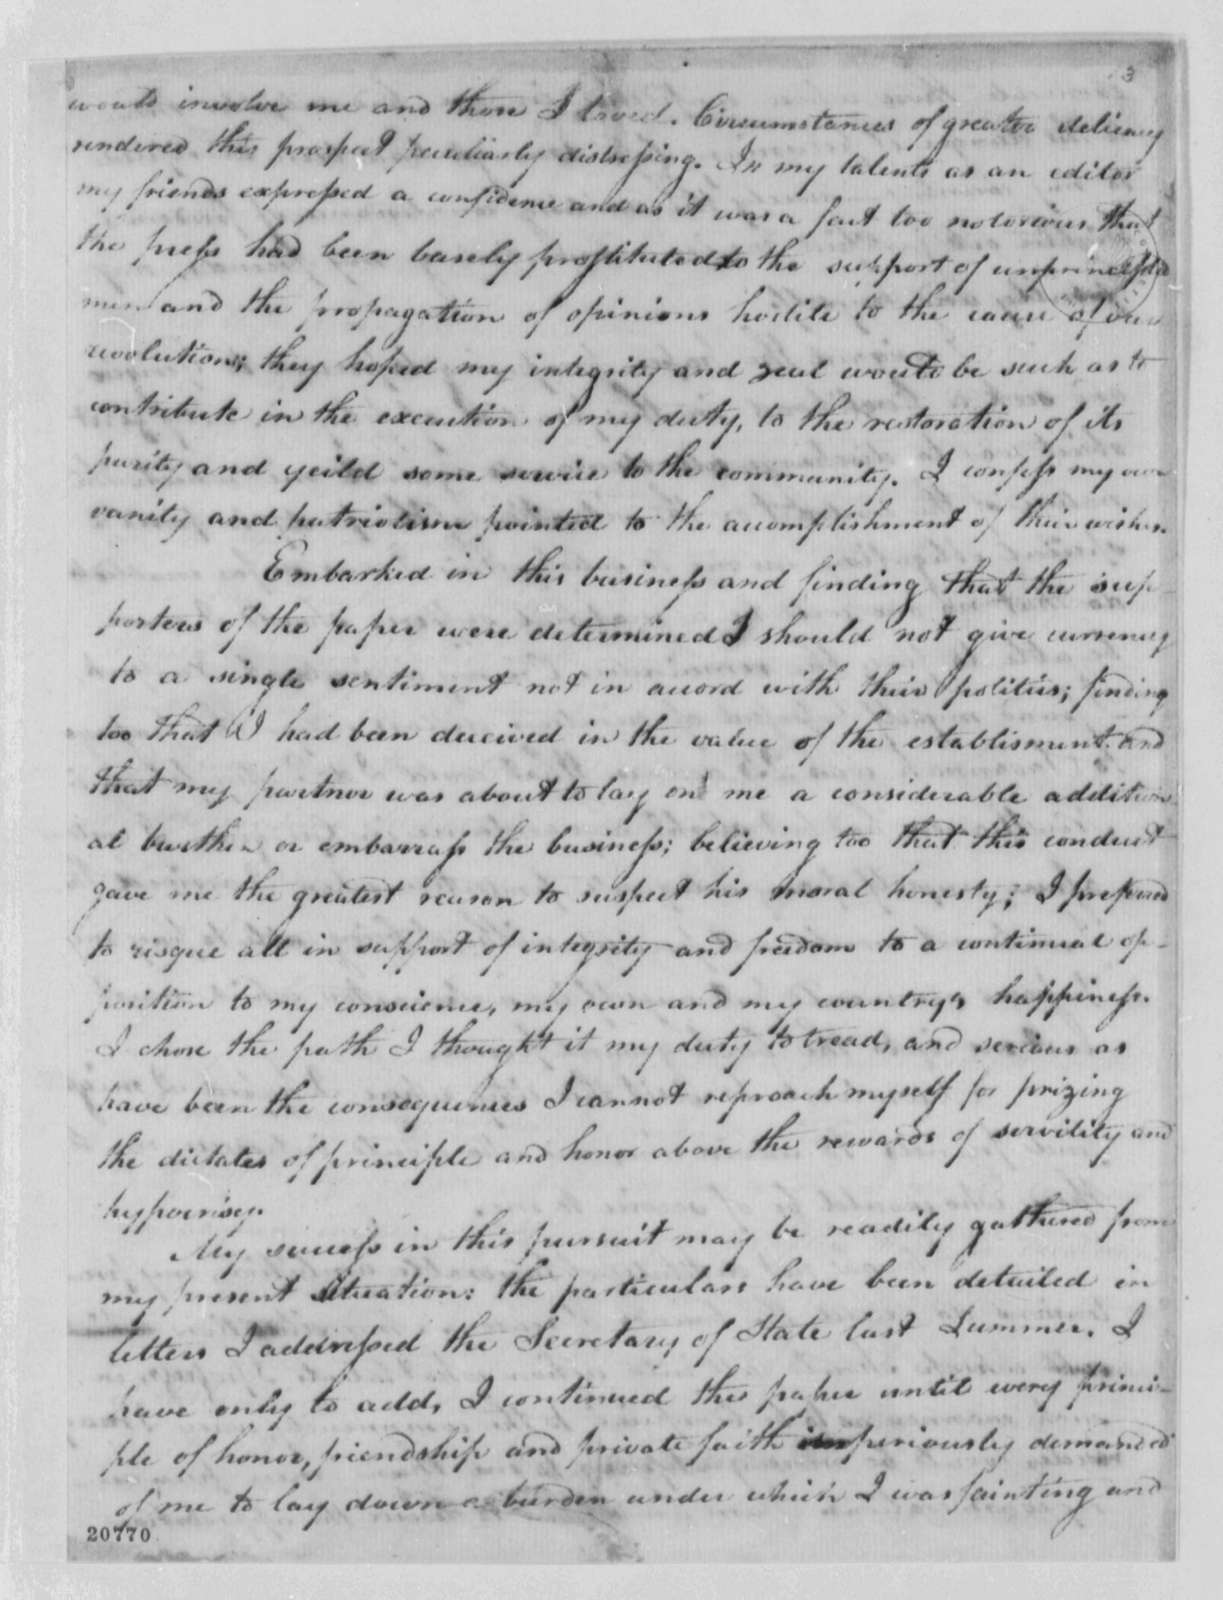 Samuel Morse to Thomas Jefferson, February 4, 1802